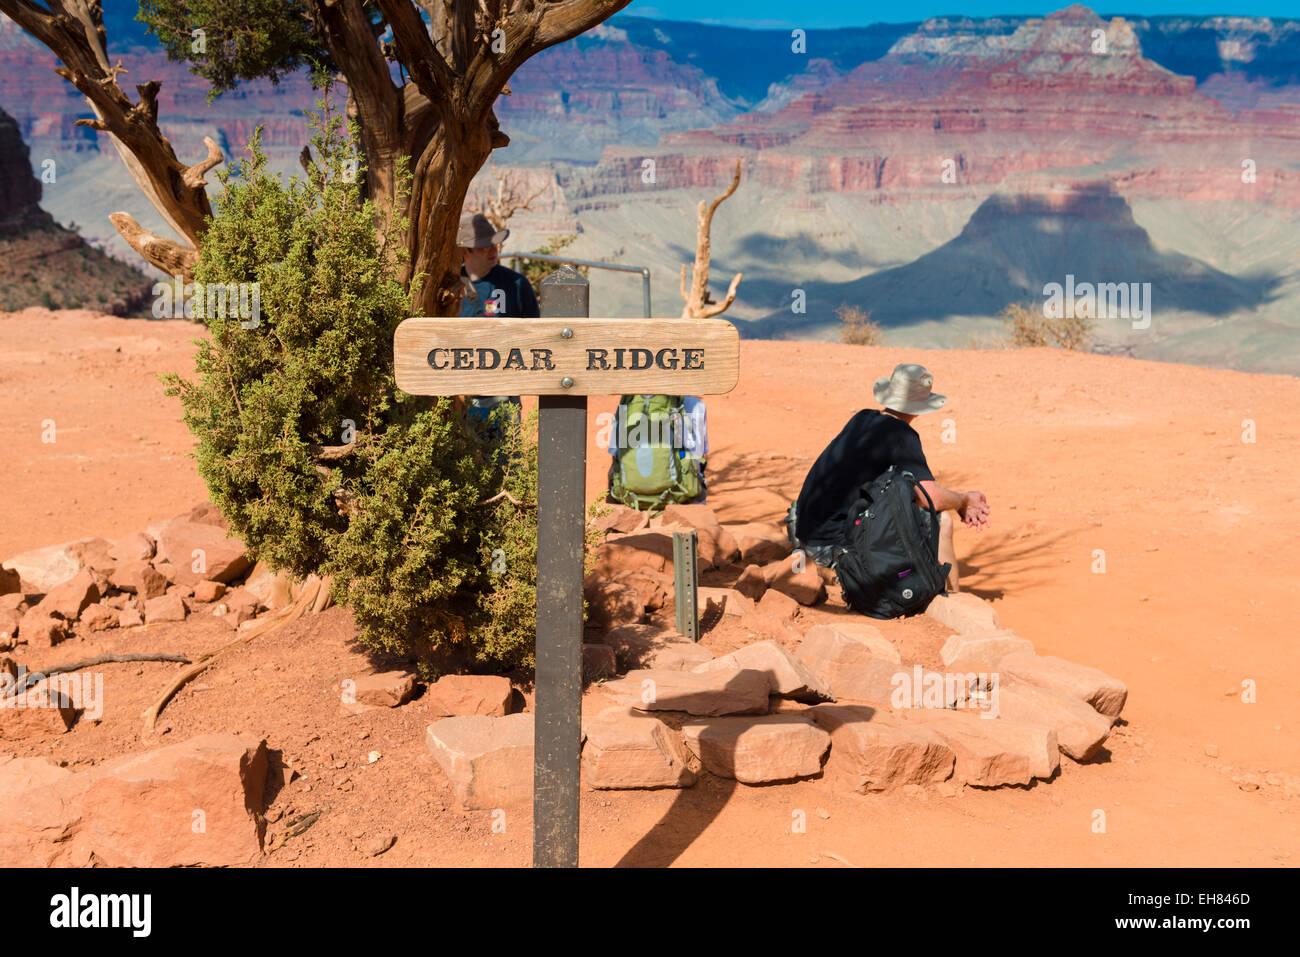 Cedar Ridge on South Kaibab Trail, Grand Canyon National Park - Stock Image